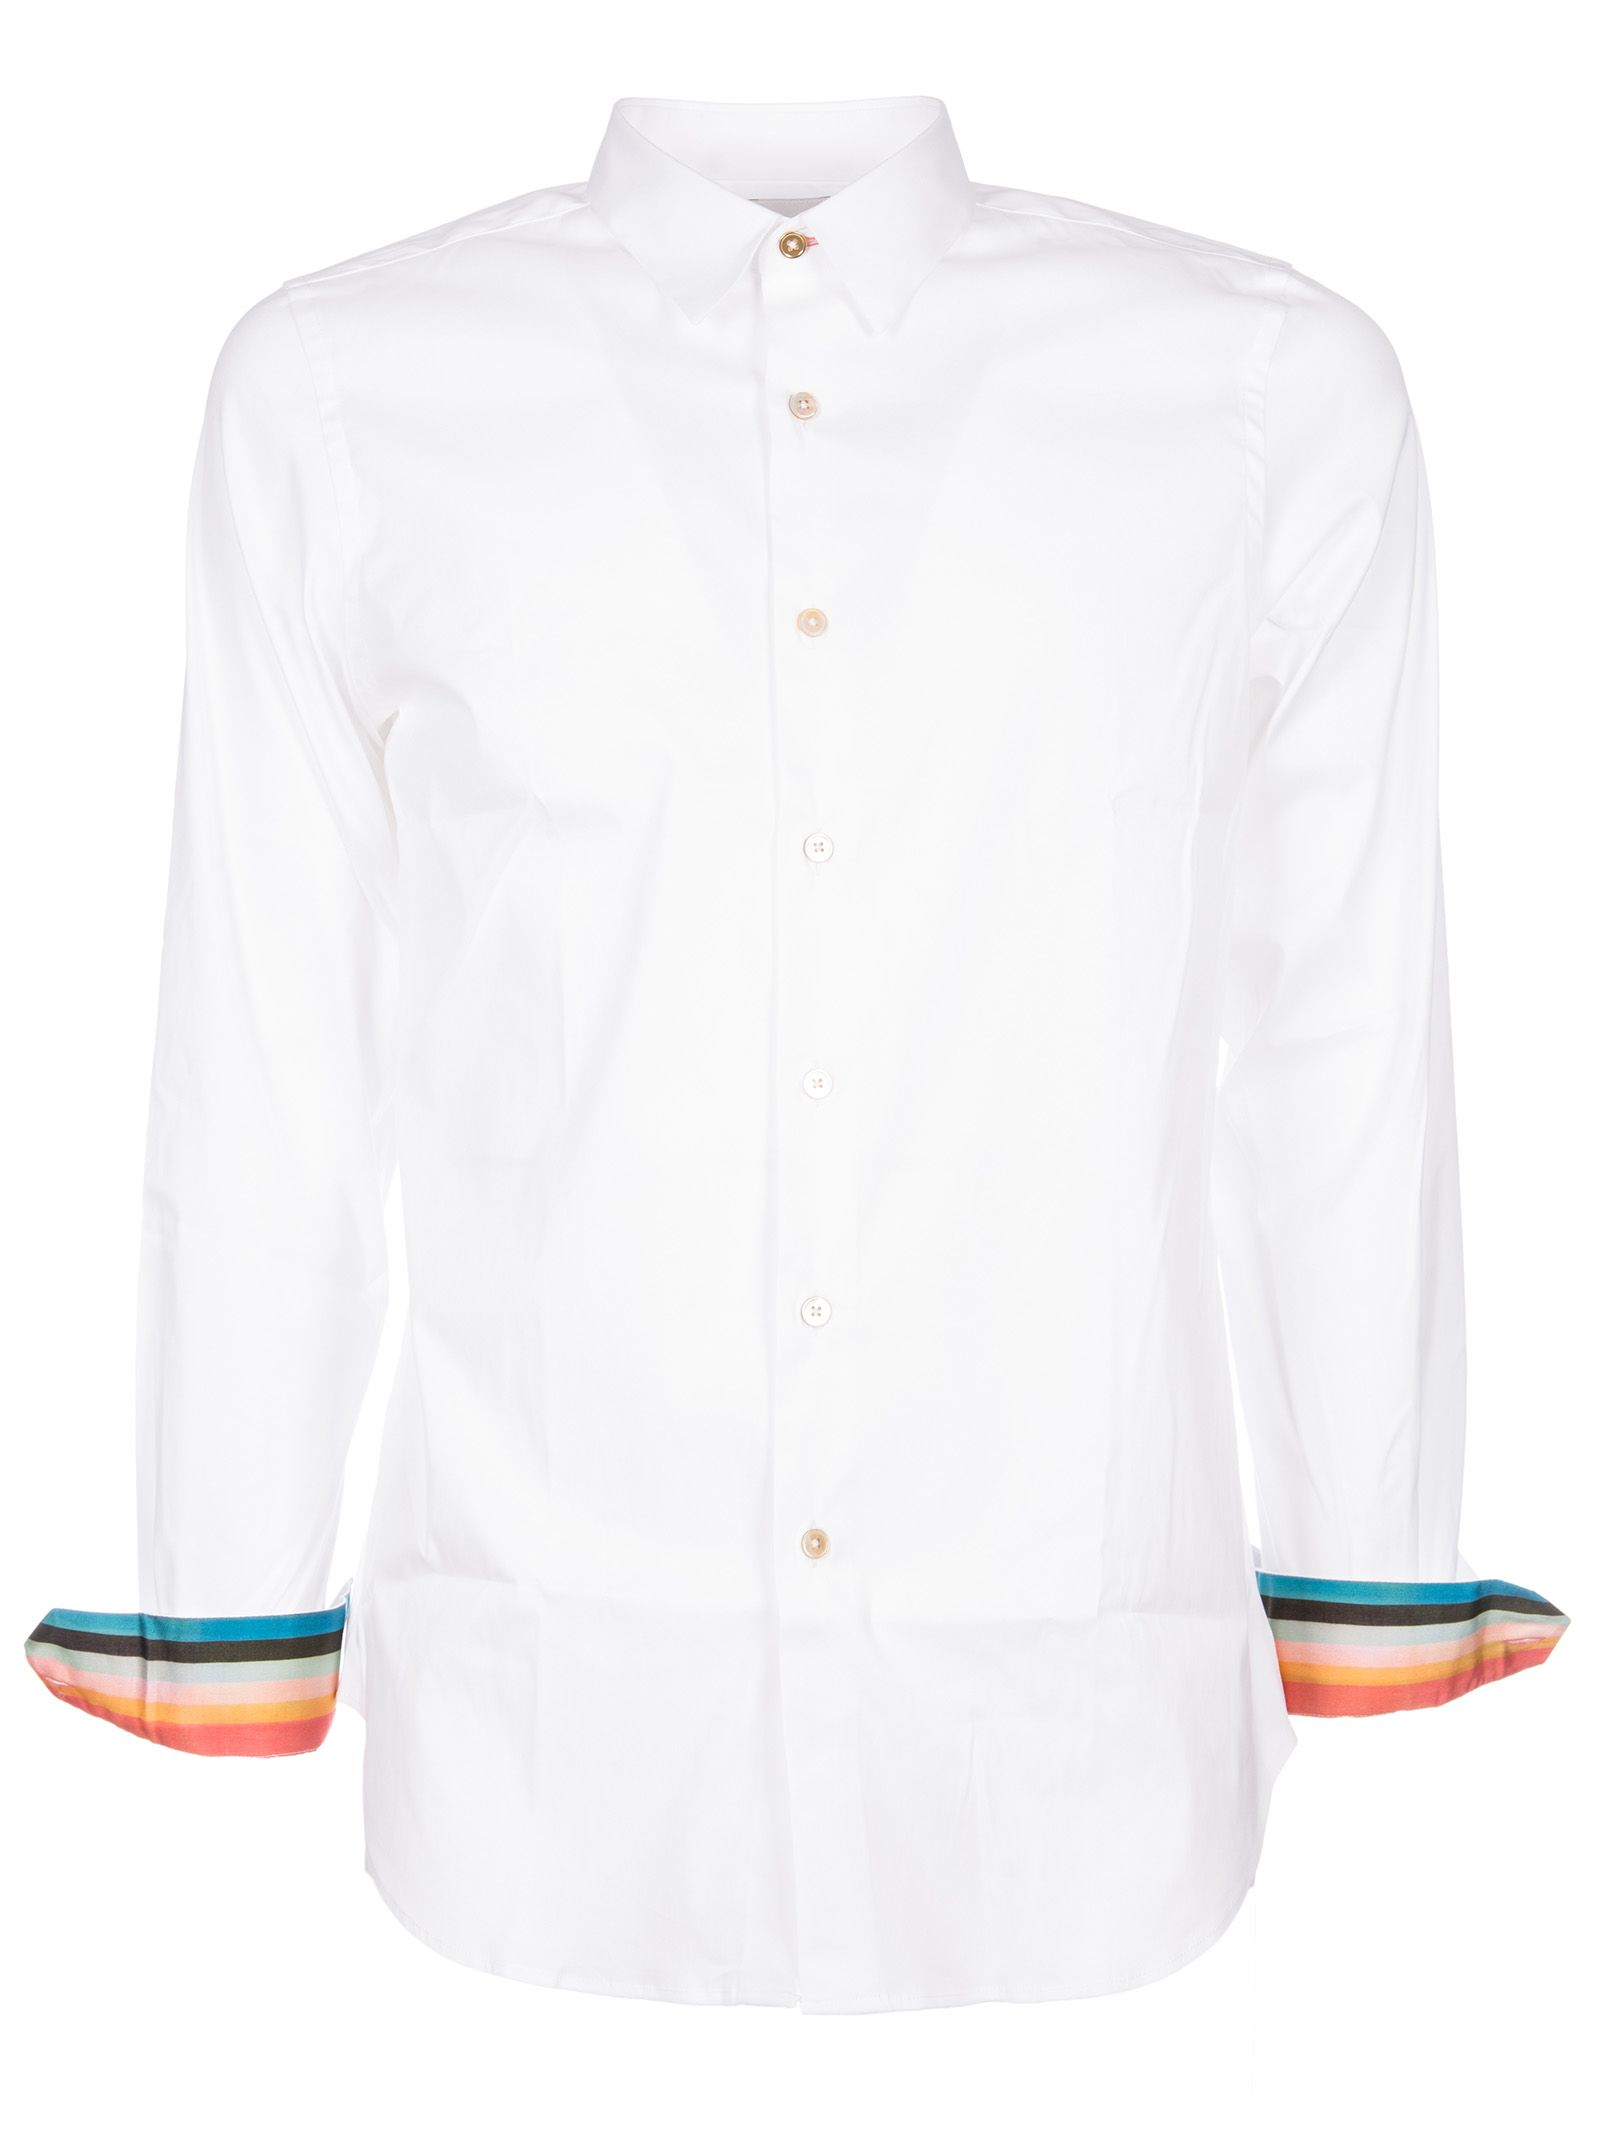 Paul Smith Striped Cuff Shirt